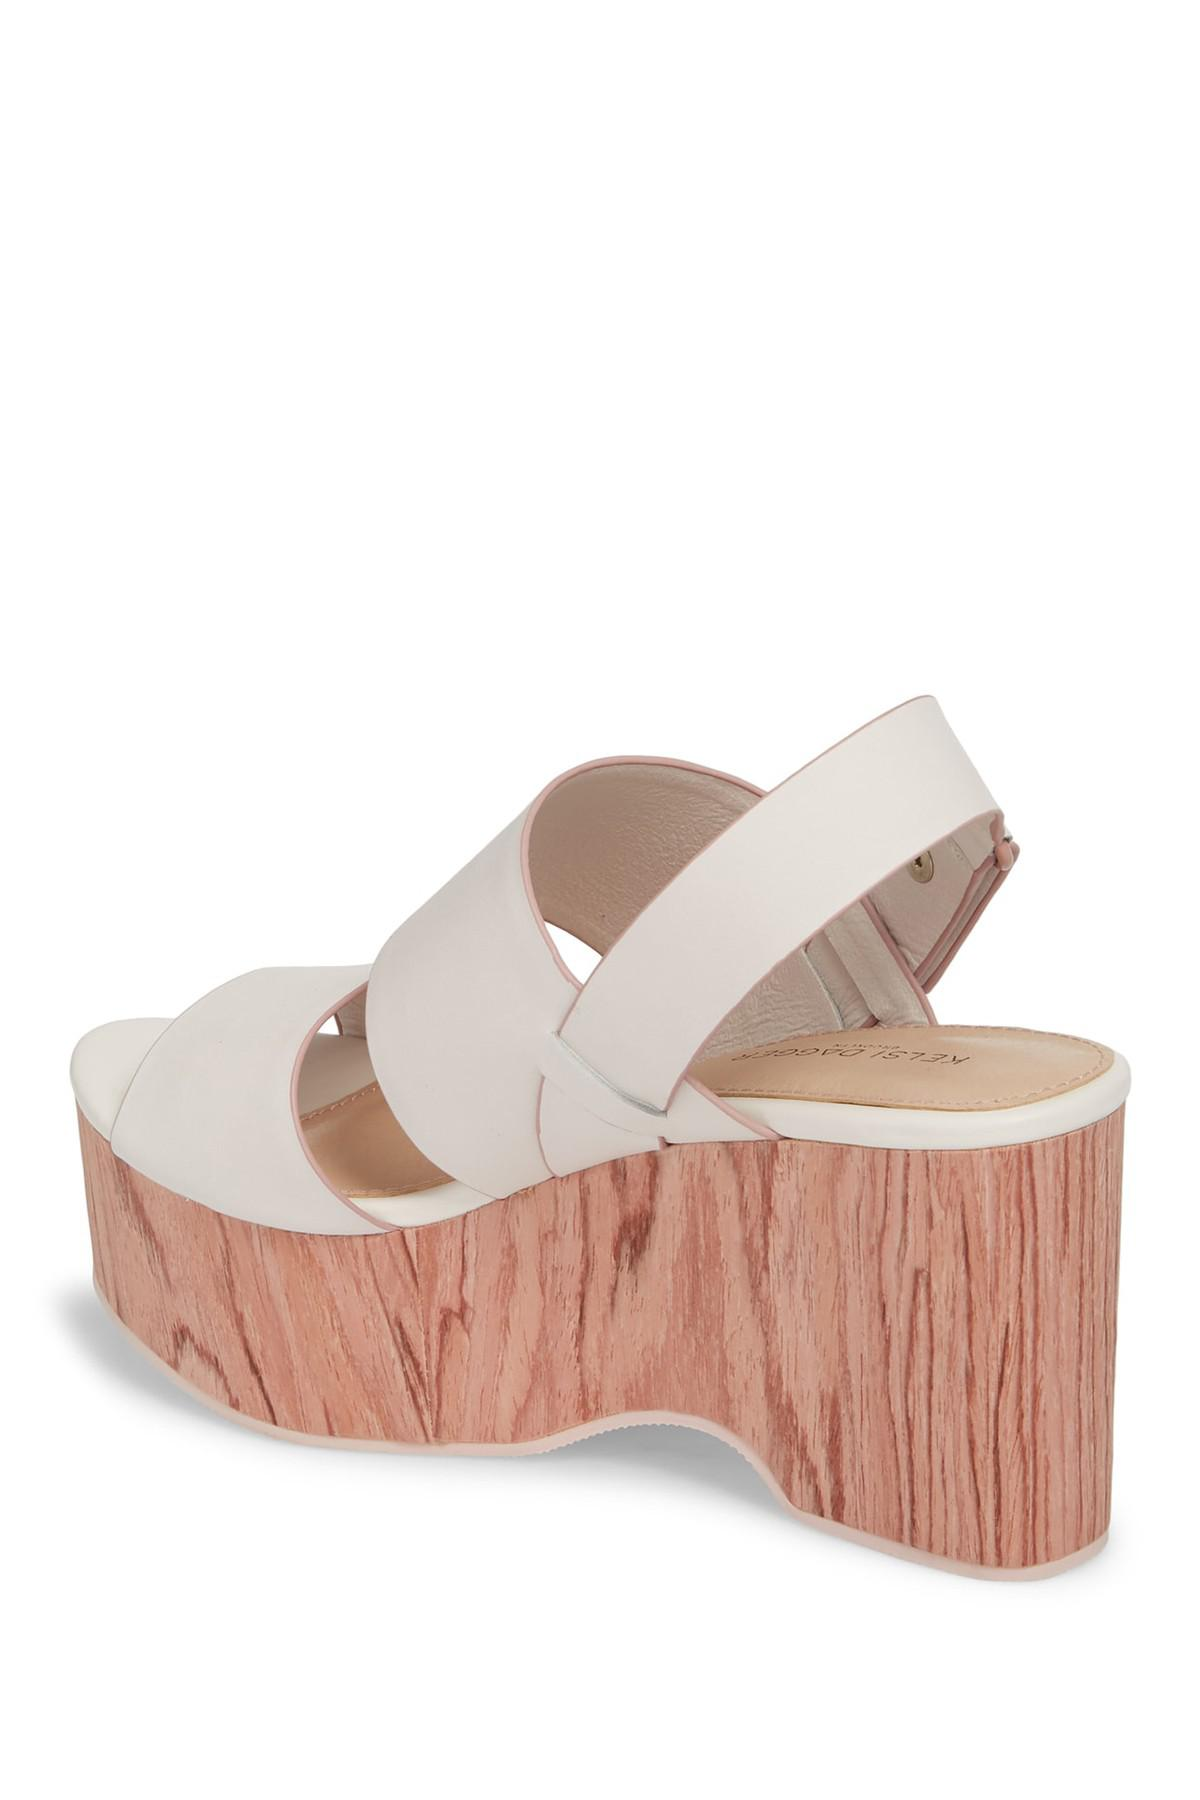 12c6352f6bc Lyst - Kelsi Dagger Brooklyn Nash Platform Wedge Sandal (women) in White